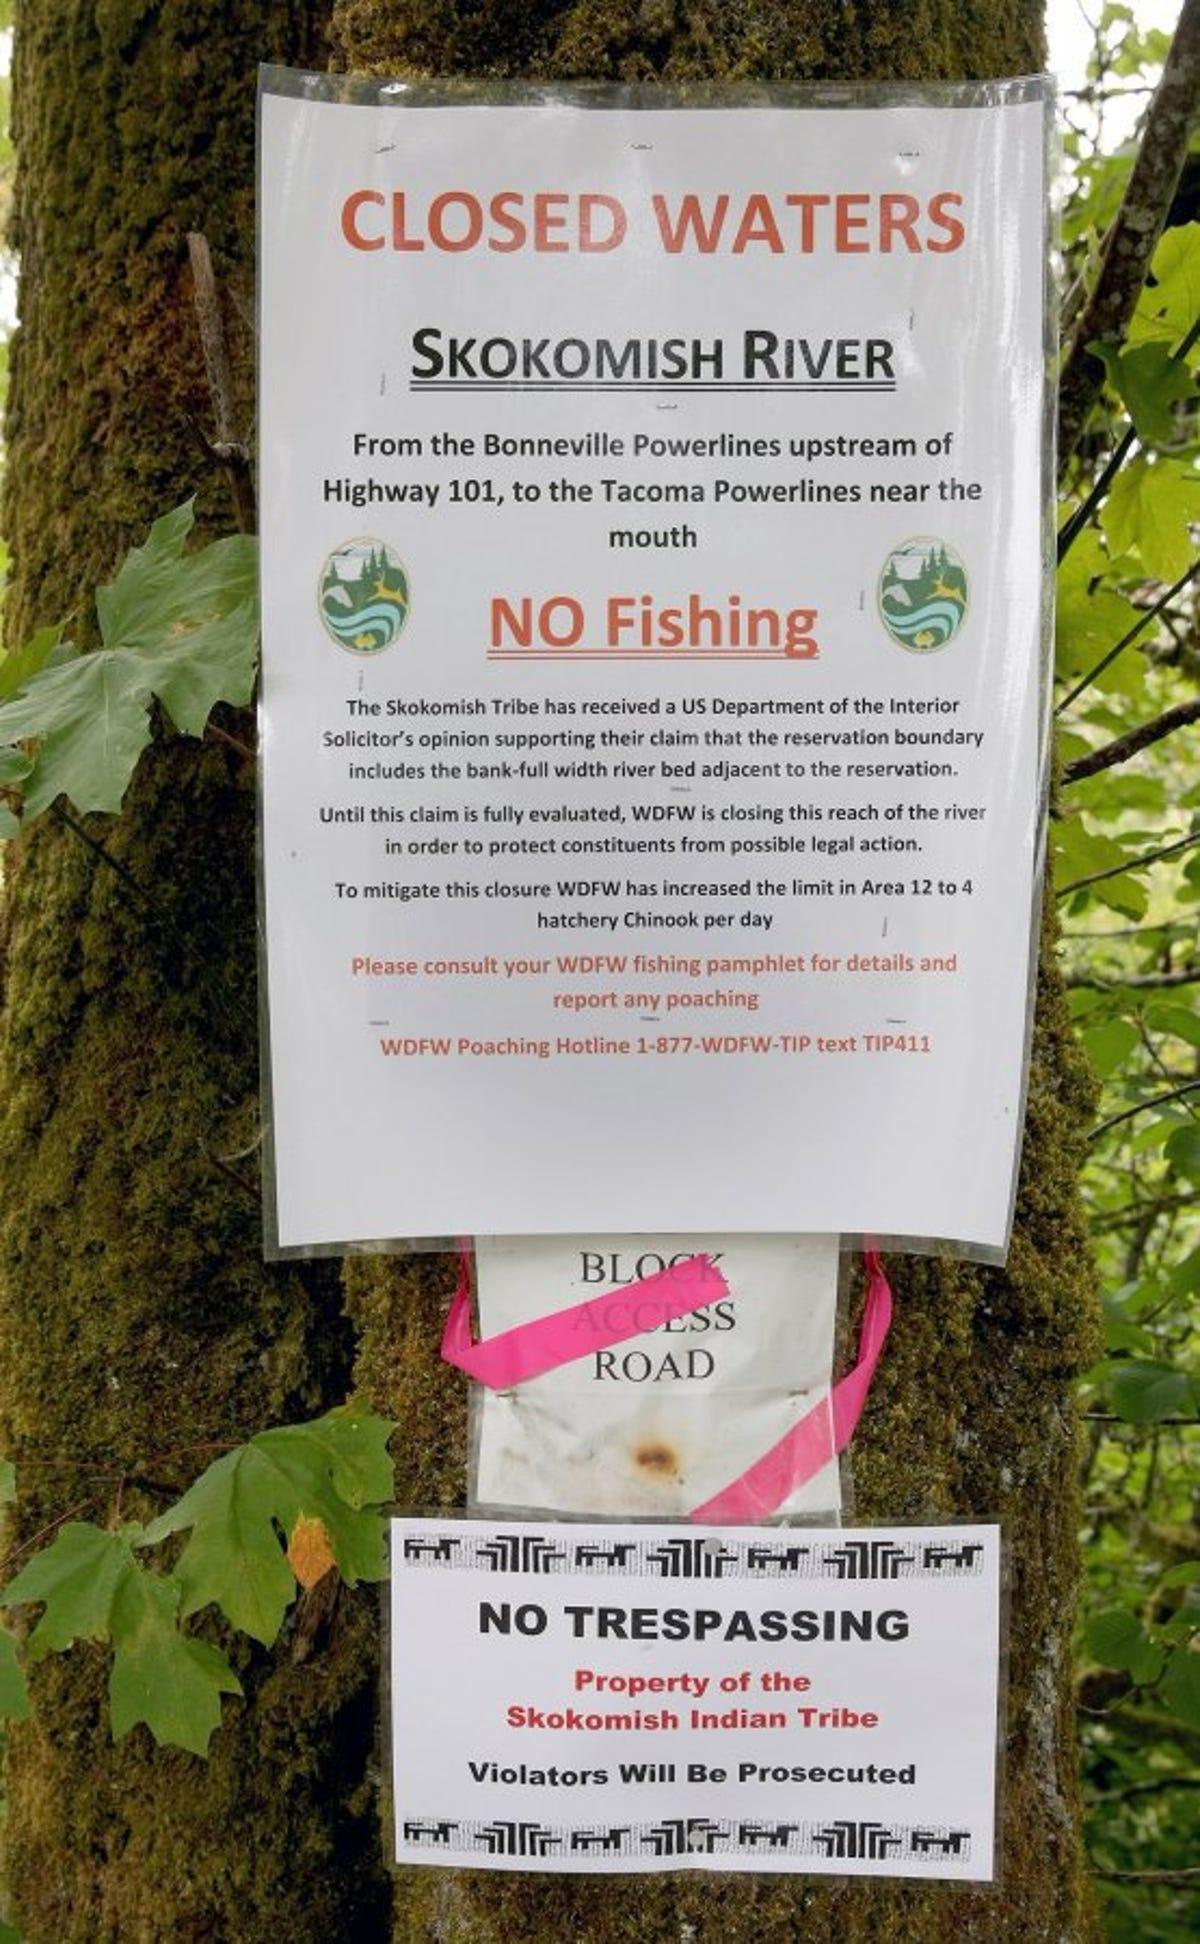 Lower Skokomish to remain closed to anglers